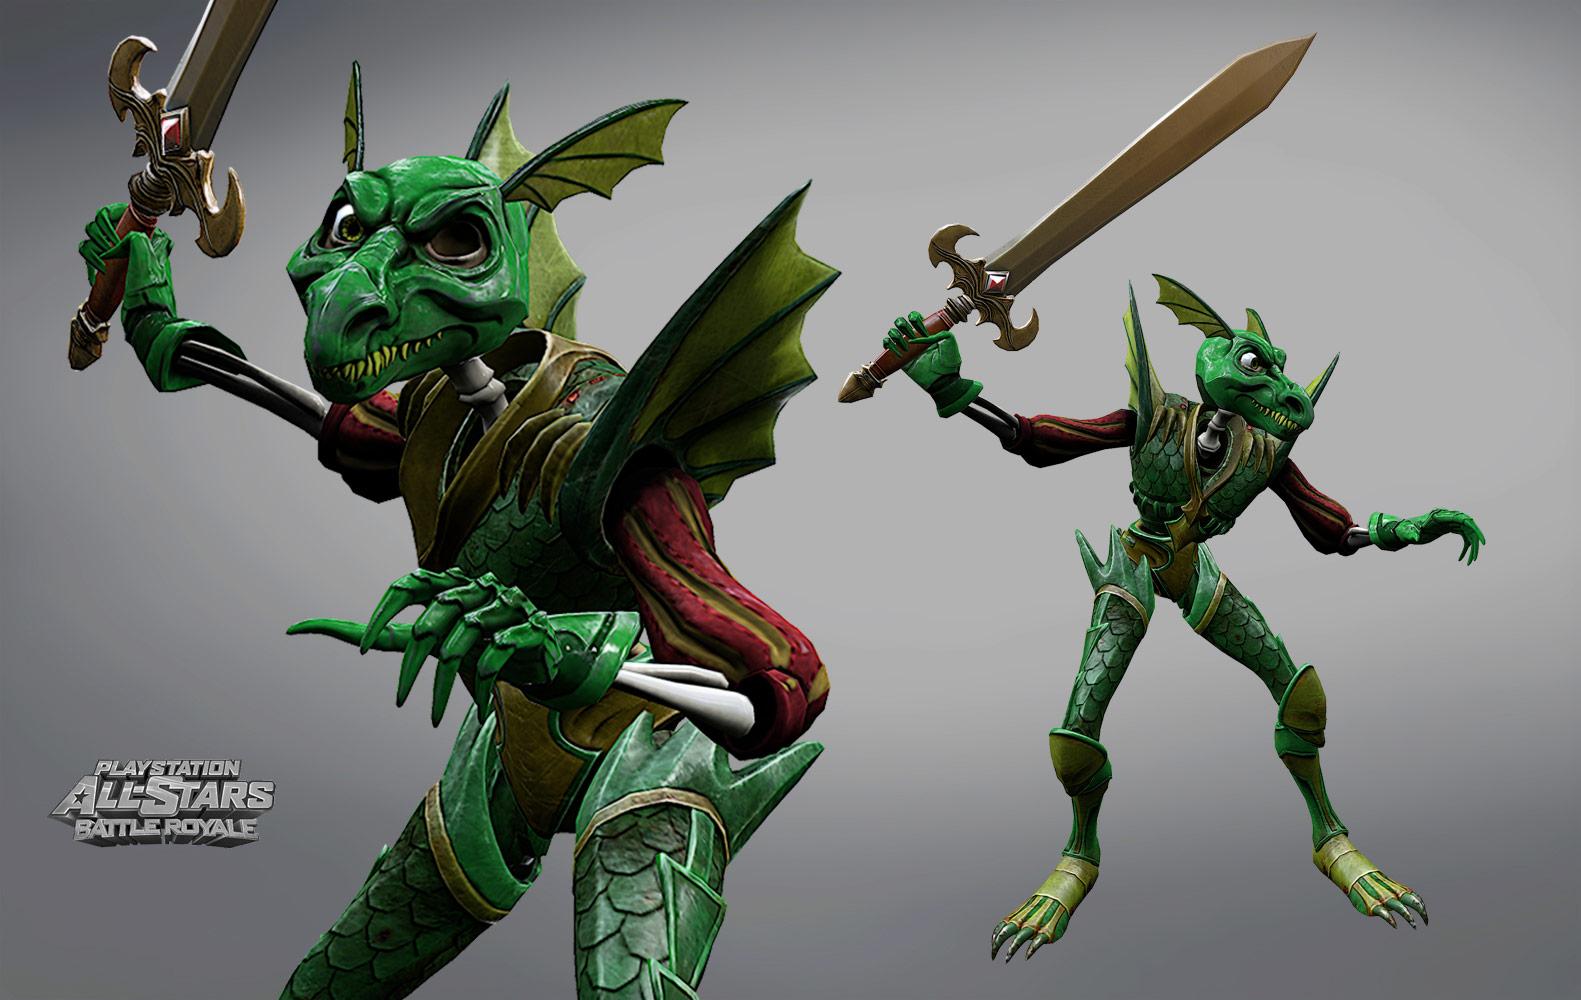 Sir Daniel's Dragon Armor in PlayStation All-Stars Battle Royale image #1